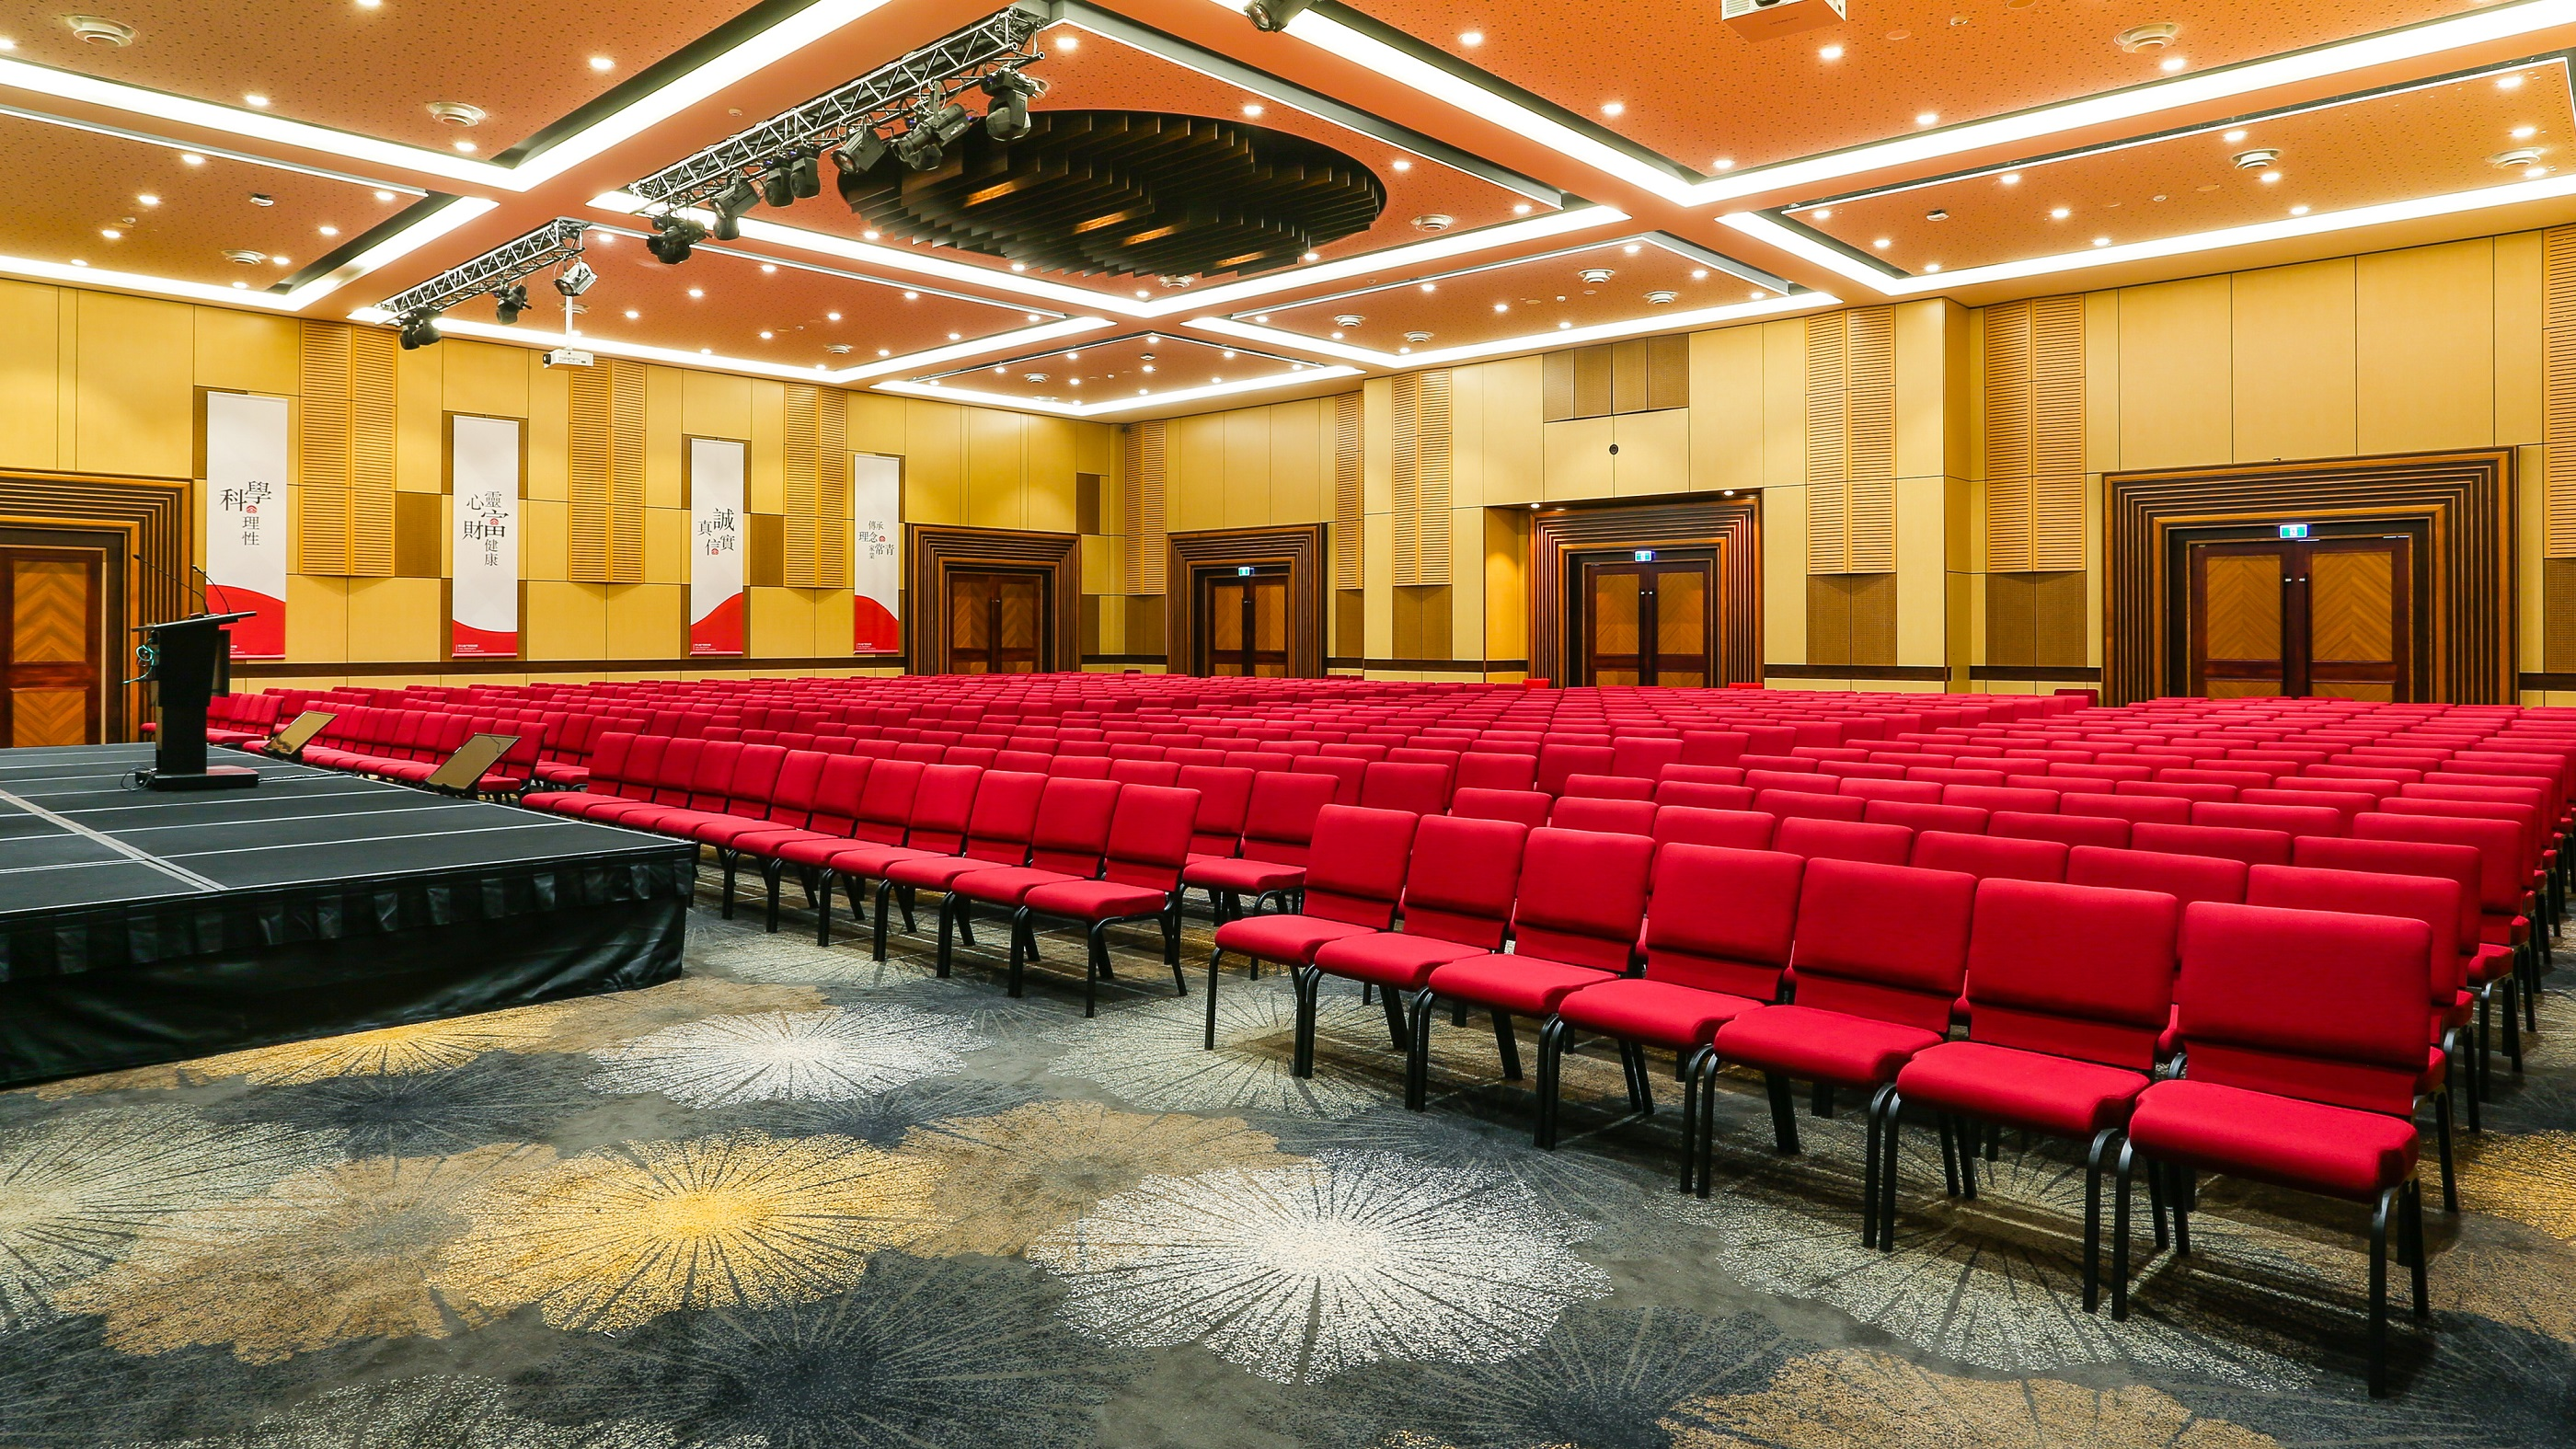 http://www.getset.com.au/wp-content/uploads/2018/12/PIA-Auditorium-1.jpg